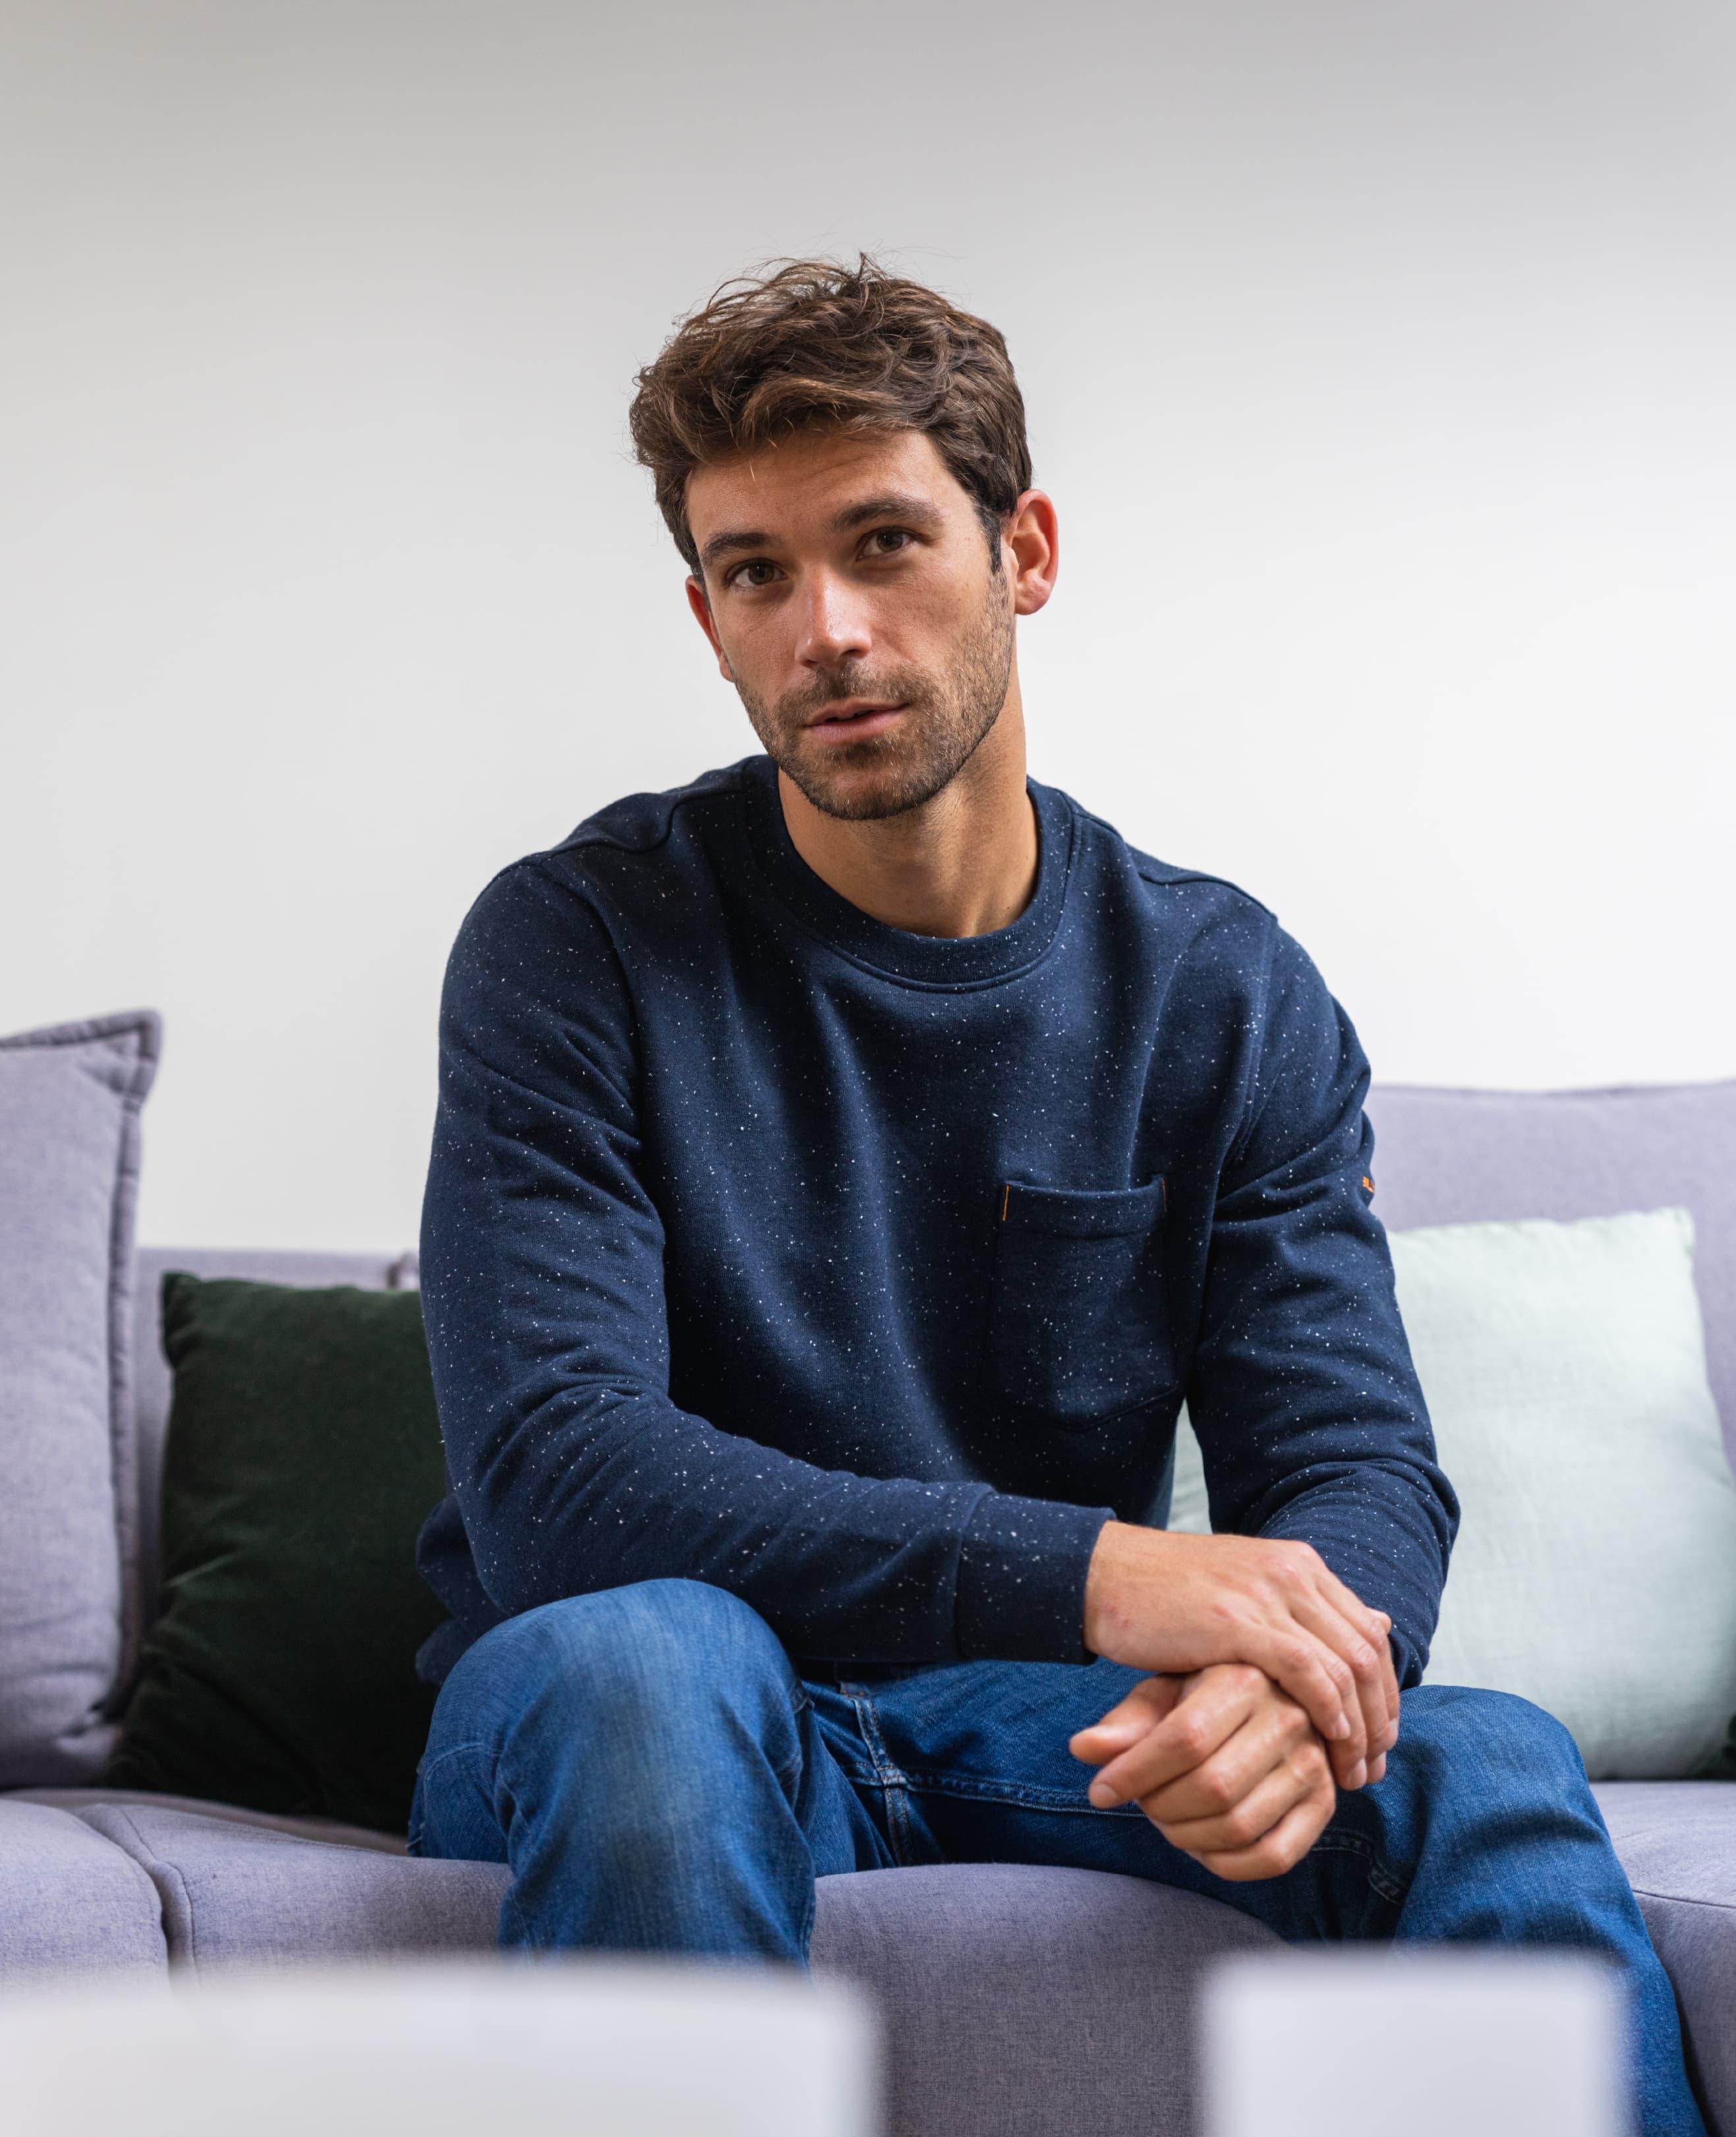 sweatshirt for men blue and comfortable